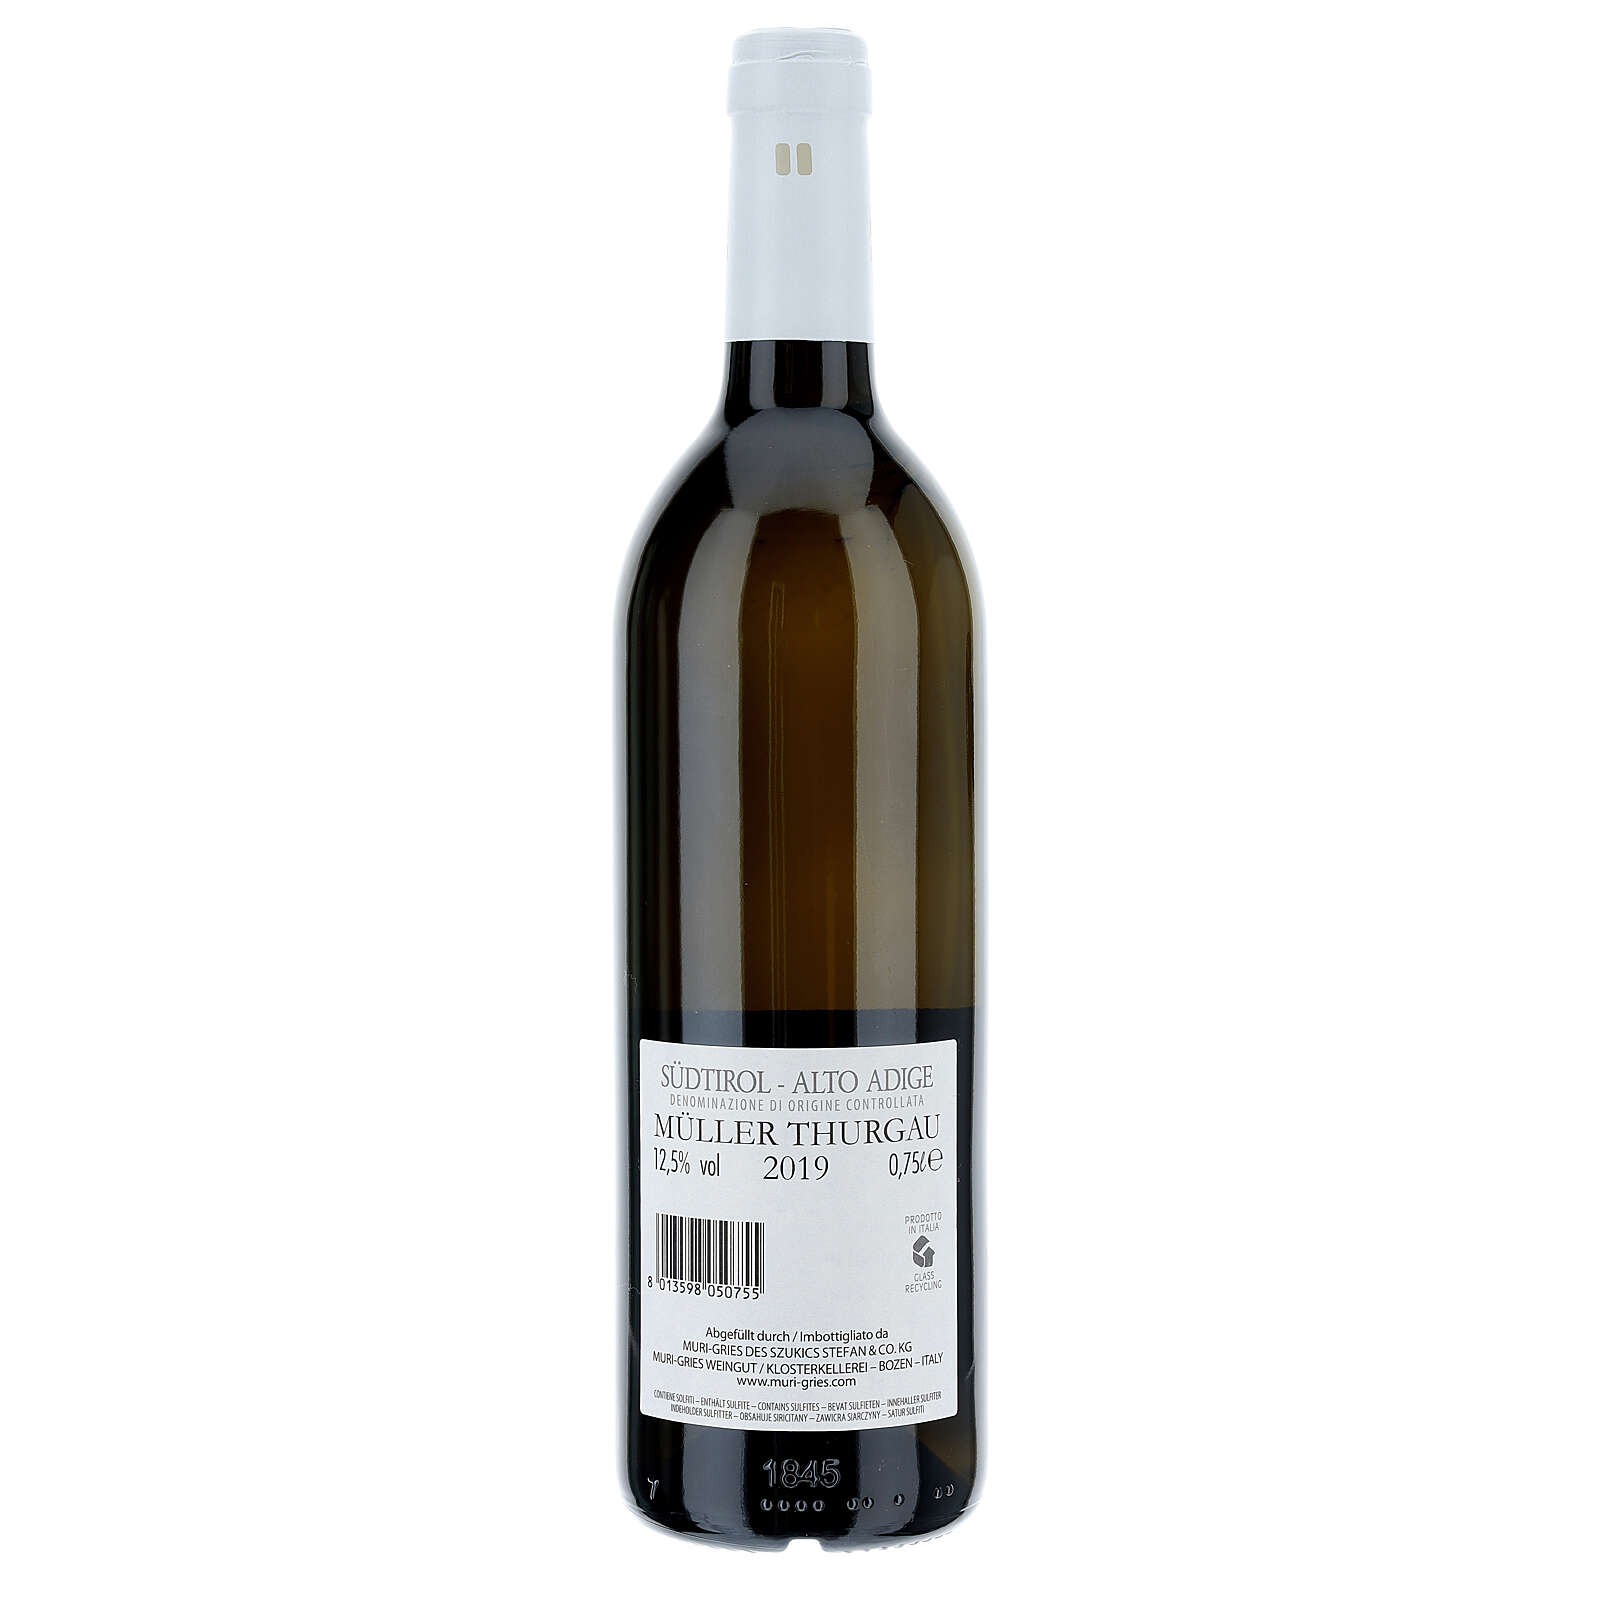 Vin Muller Thurgau DOC 2019 Abbaye Muri Gries 750ml 3